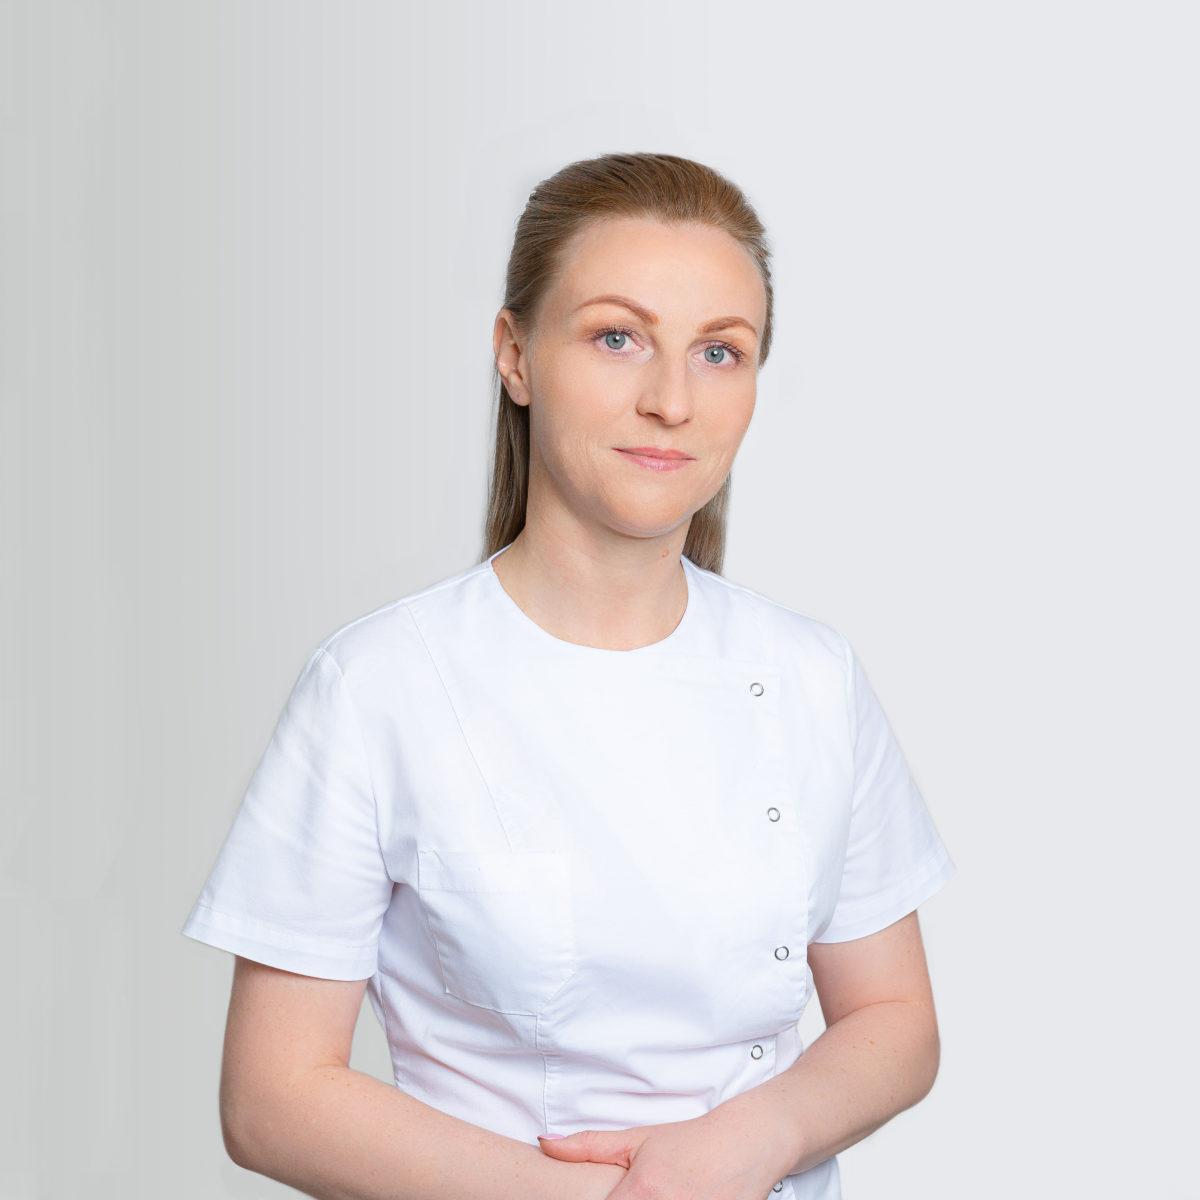 Мельникова Елена Викторовна